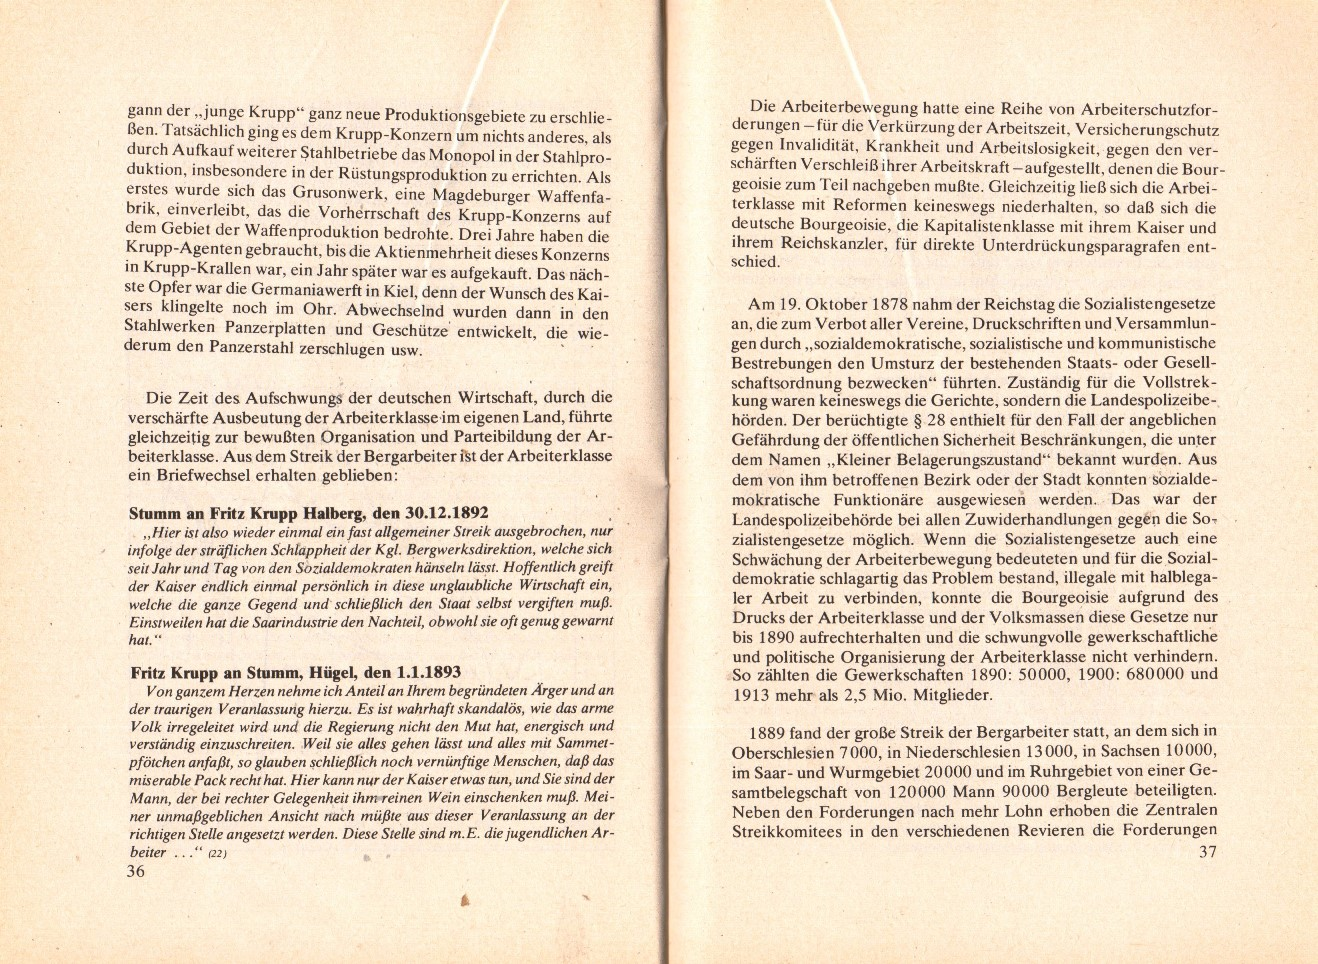 NRW_KBW_1977_Politik_der_Kohle_u_Stahlbarone_20